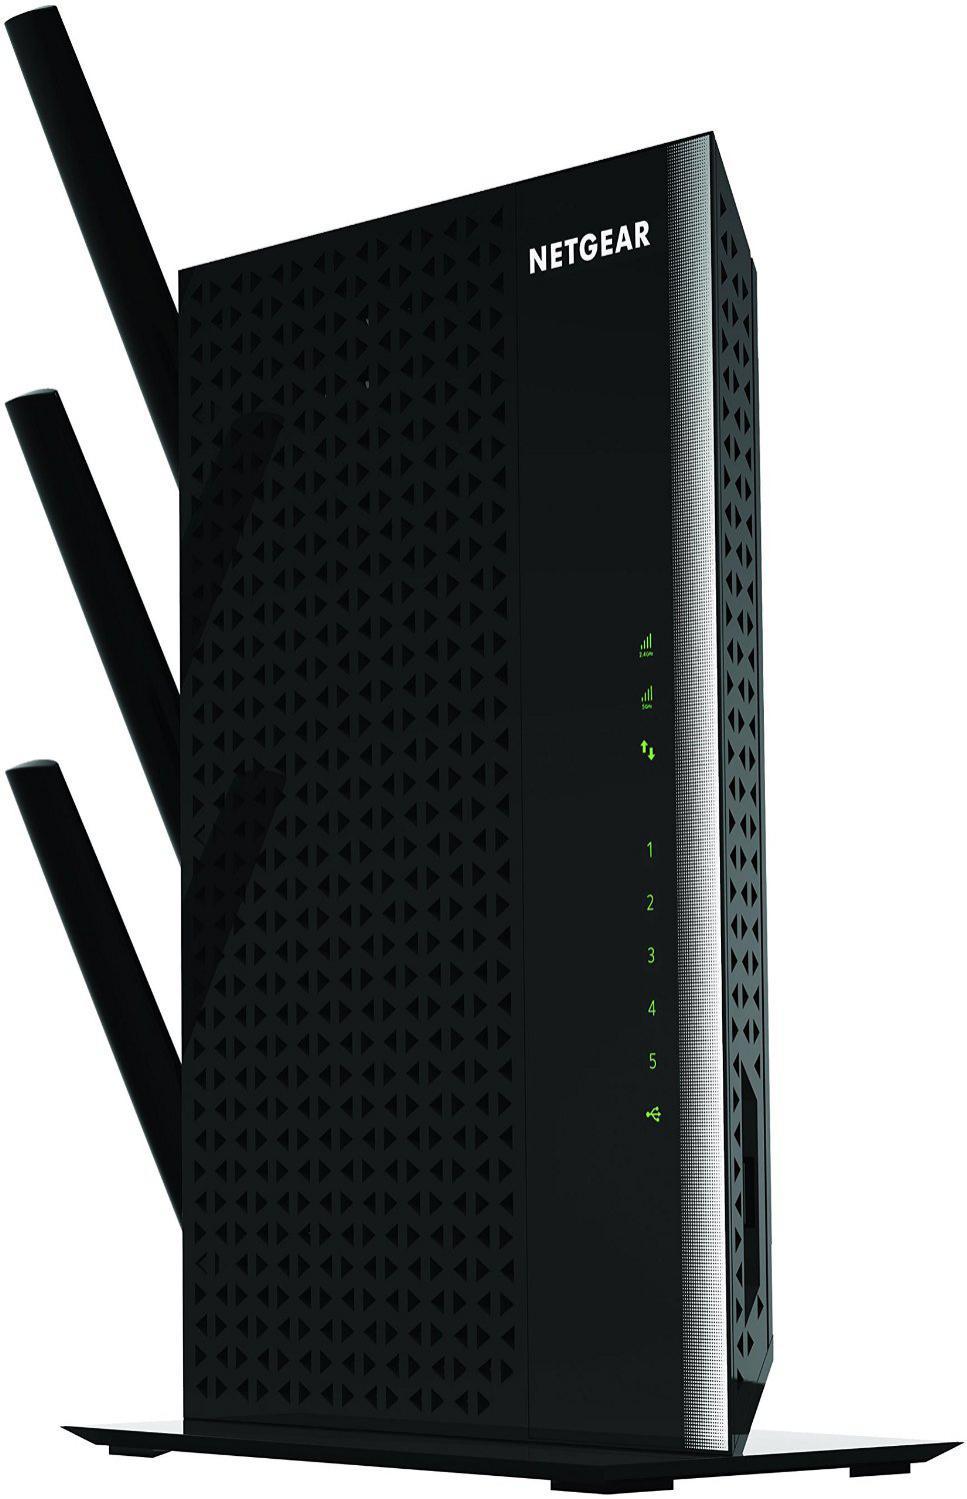 Répéteur Wi-Fi Netgear Nighthawk AC1900 EX7000-100PES - 5 ports Gigabit Dual Band Noir